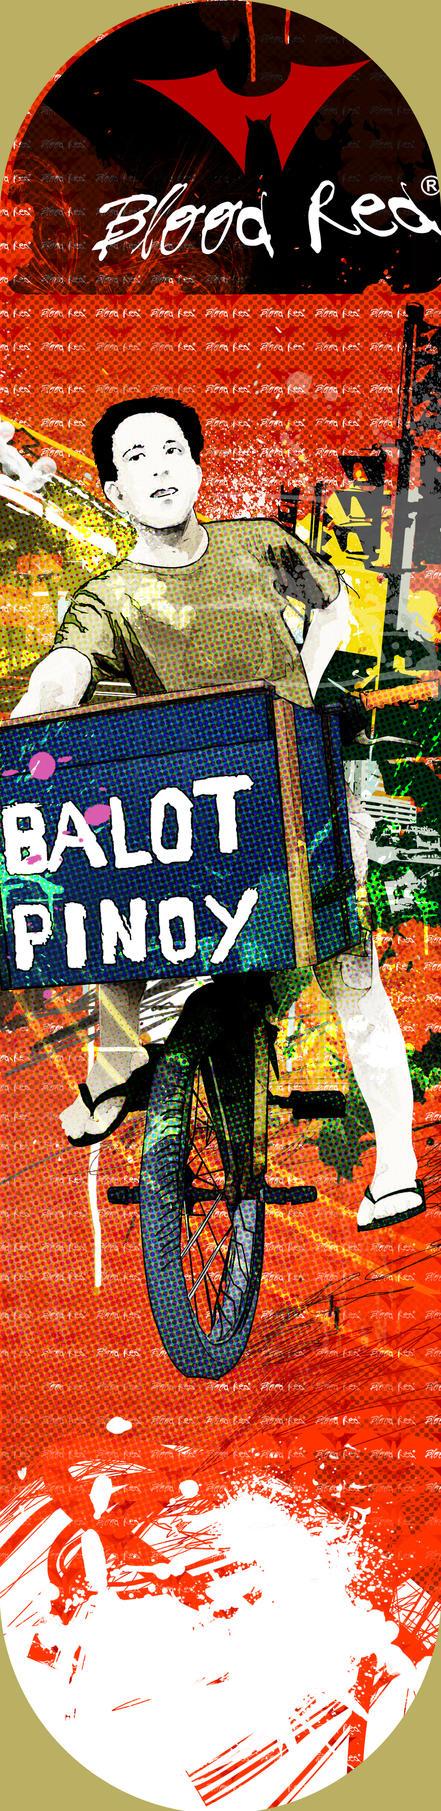 Balot Pinoy Skateboard Deck by paborito